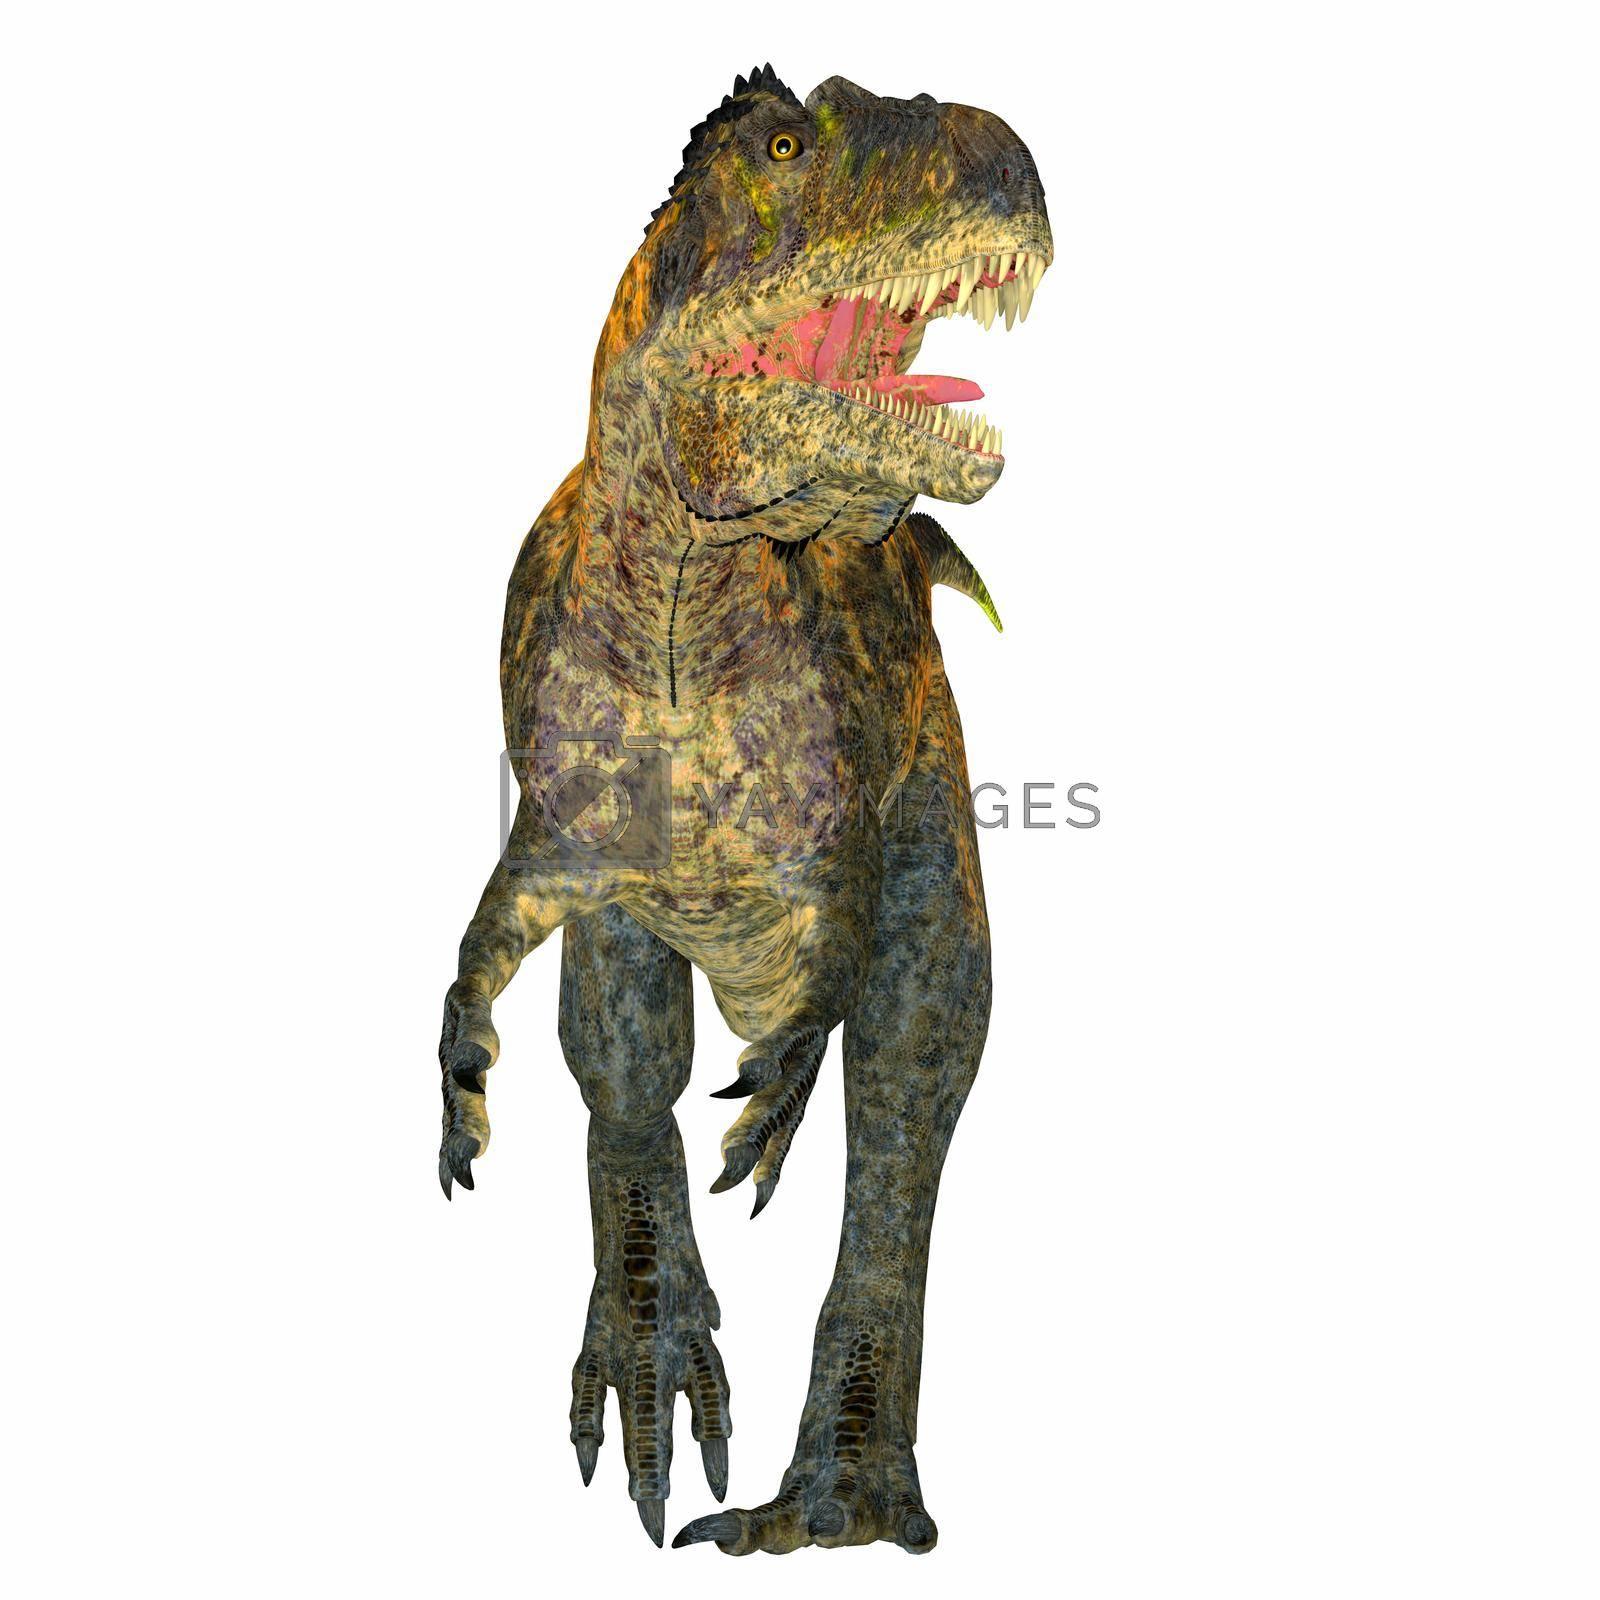 Acrocanthosaurus Dinosaur Front by Catmando